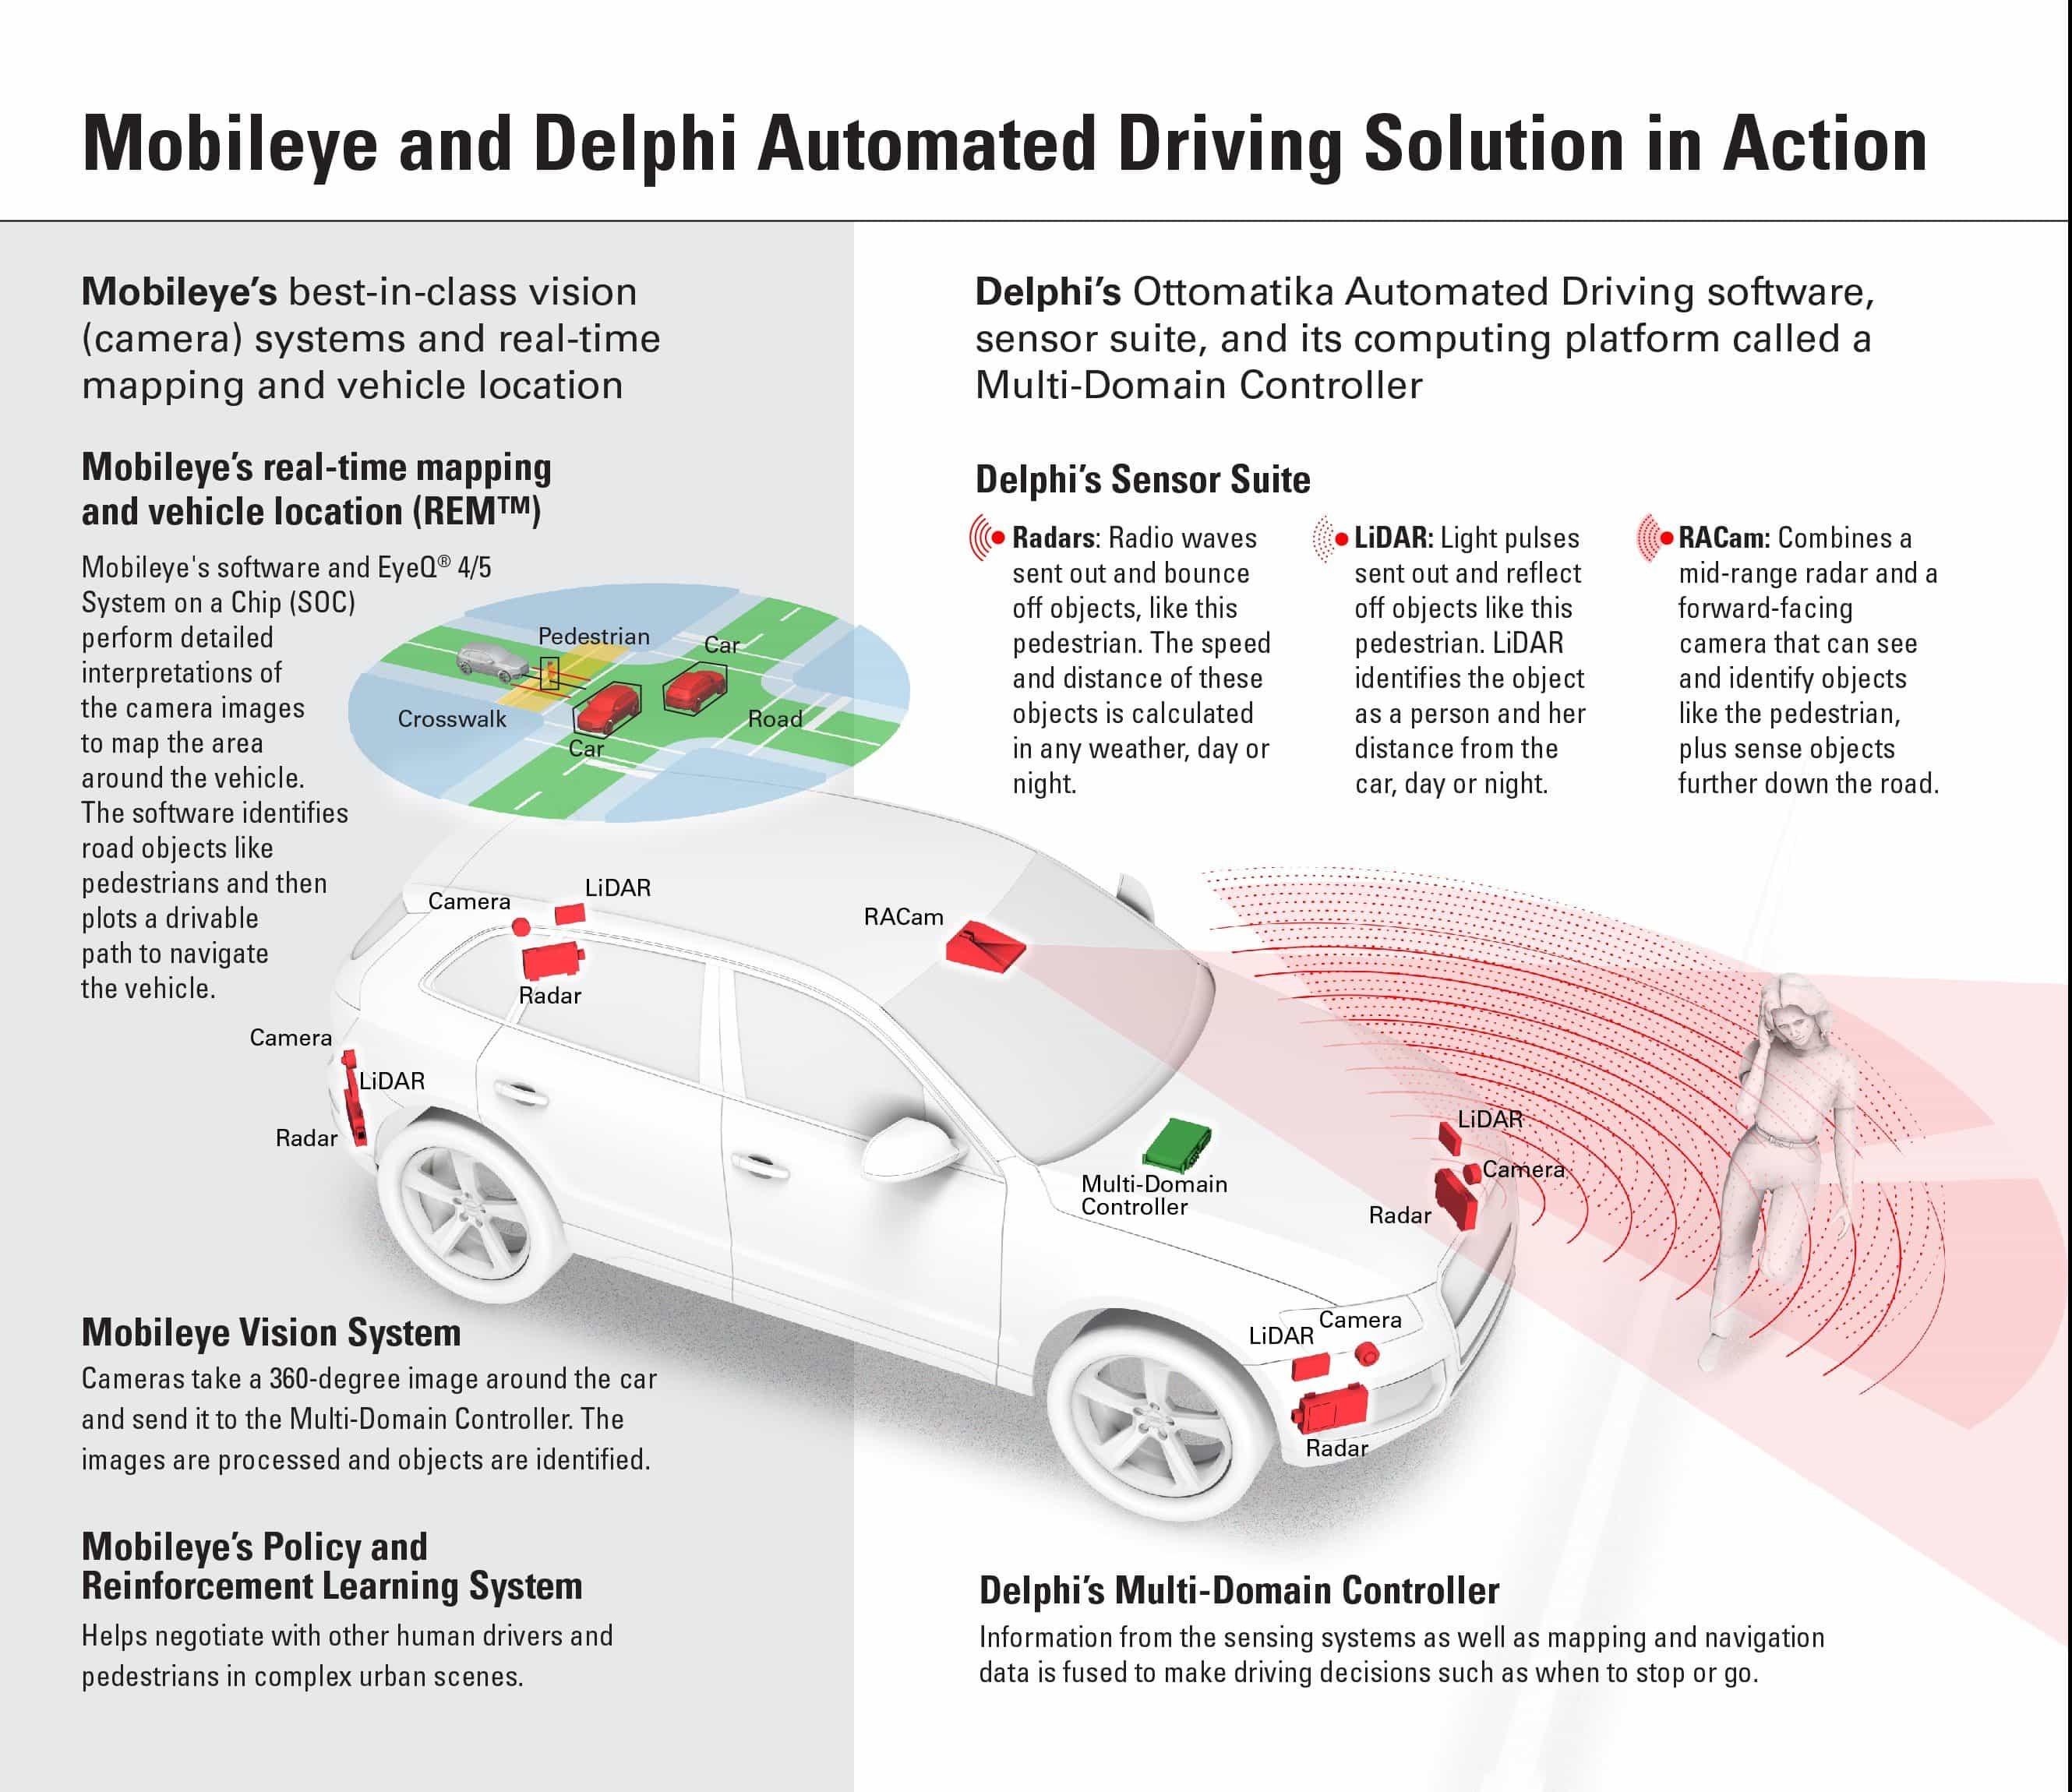 delphi mobileye infographic final e1474674632610?resize=350%2C200 iaa delphi connected cars audi, bmw, hyundai, jaguar, kia  at readyjetset.co